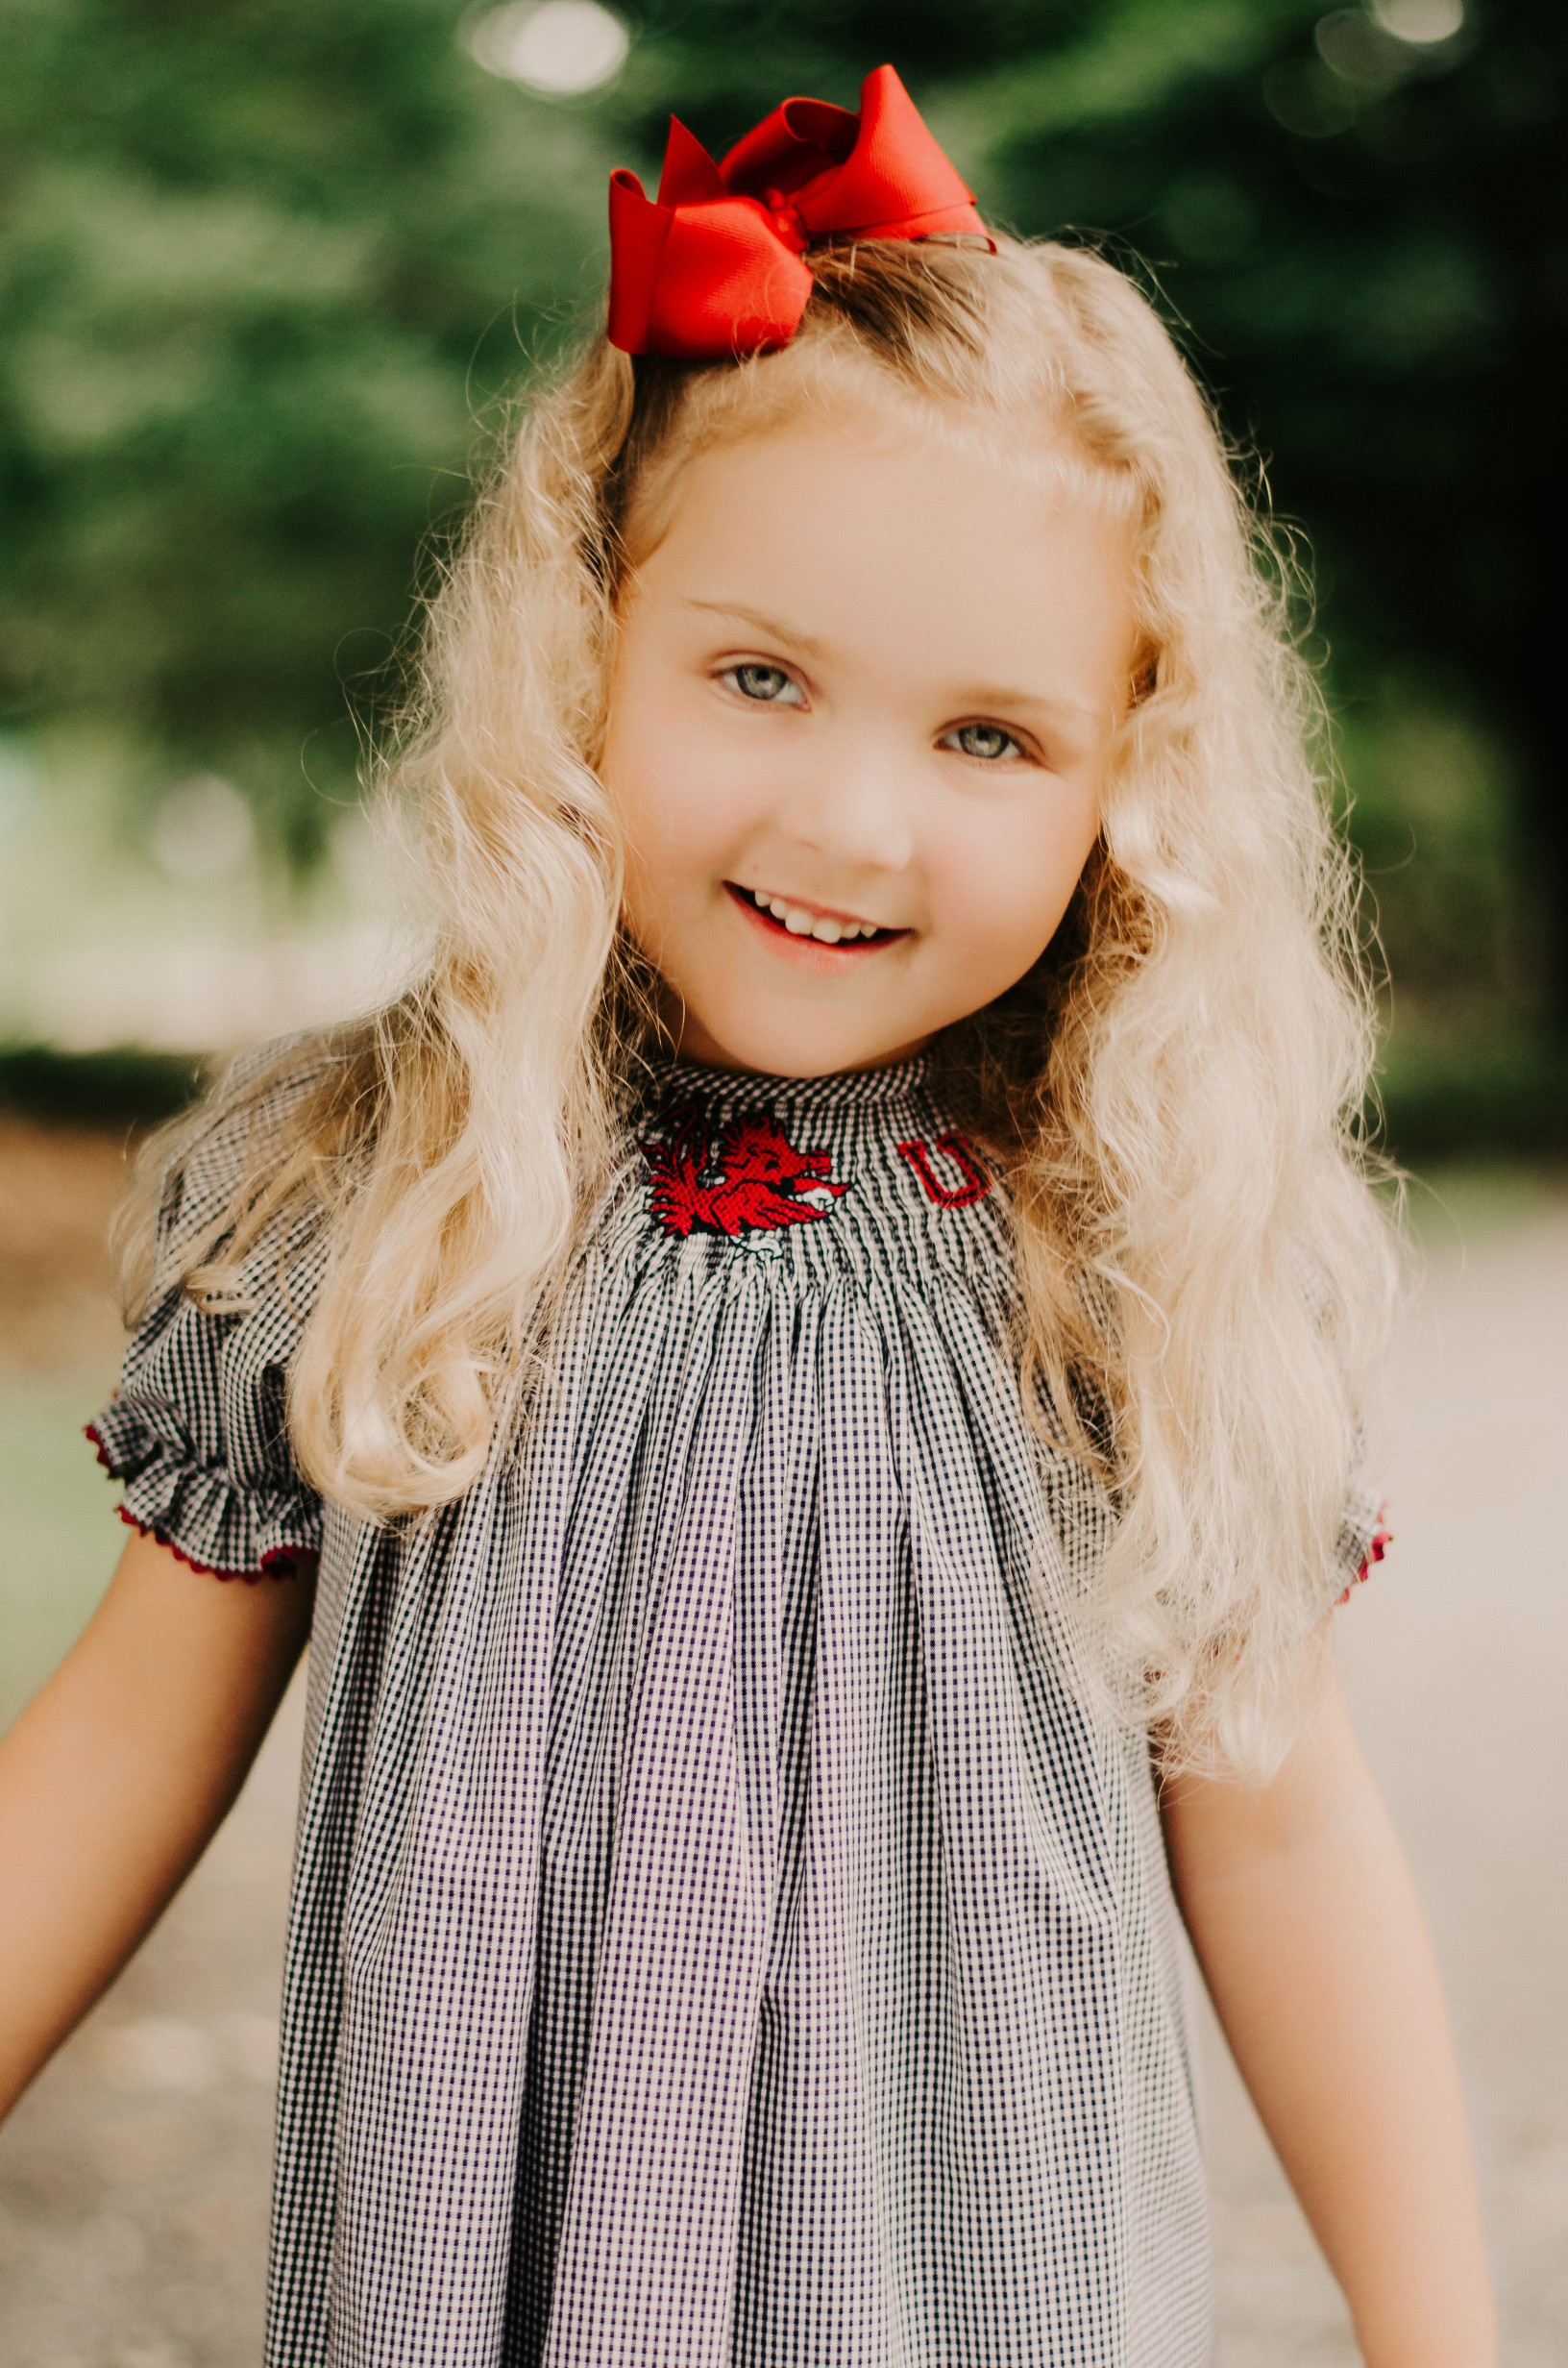 child-photography-portrait.jpg.